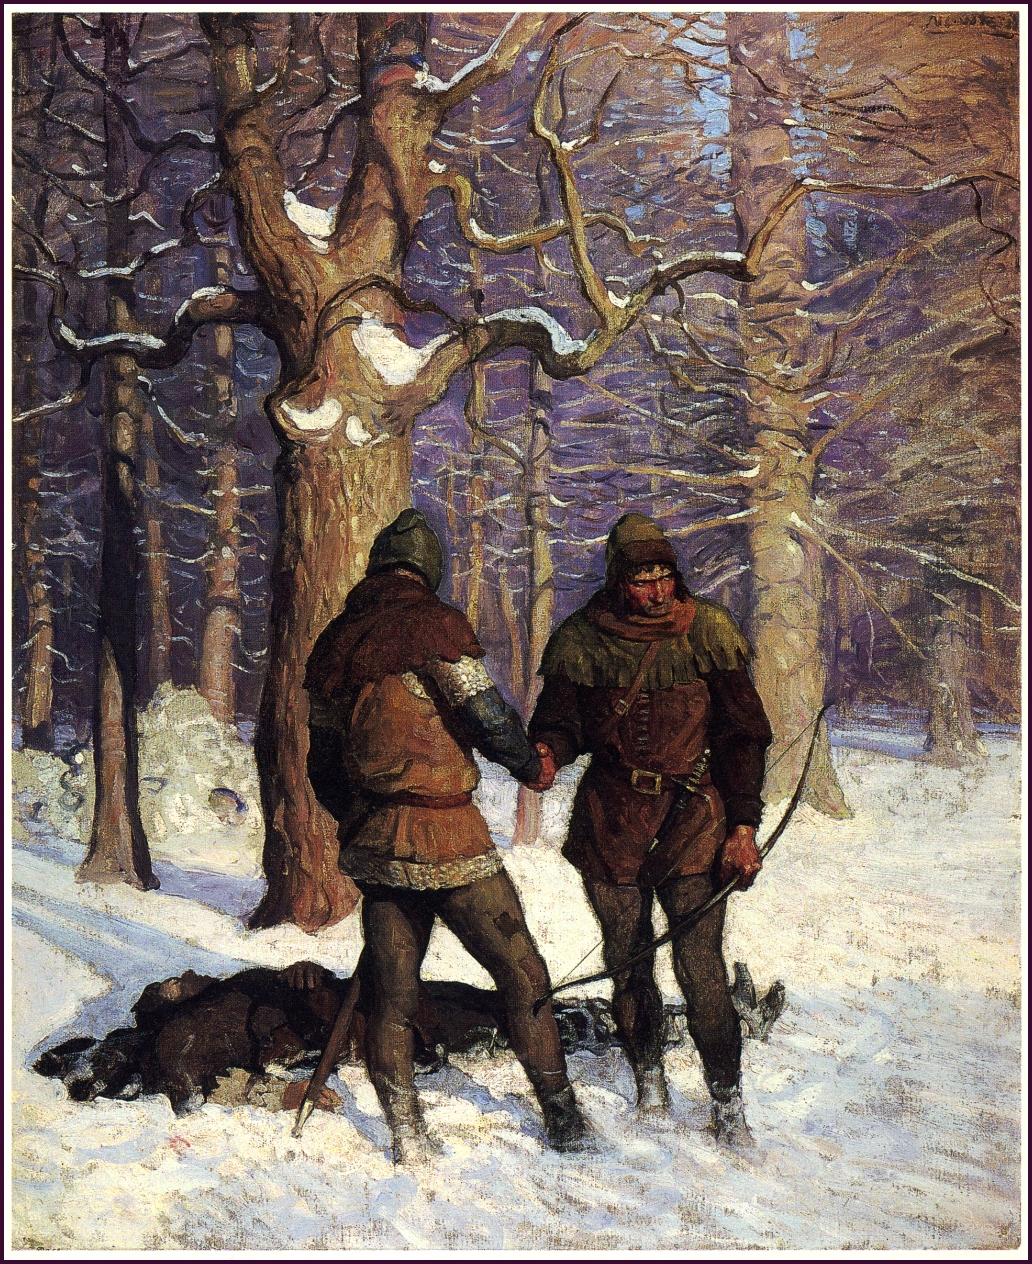 *N. C. WYETH* The Black Arrow by Robert Louis Stevenson